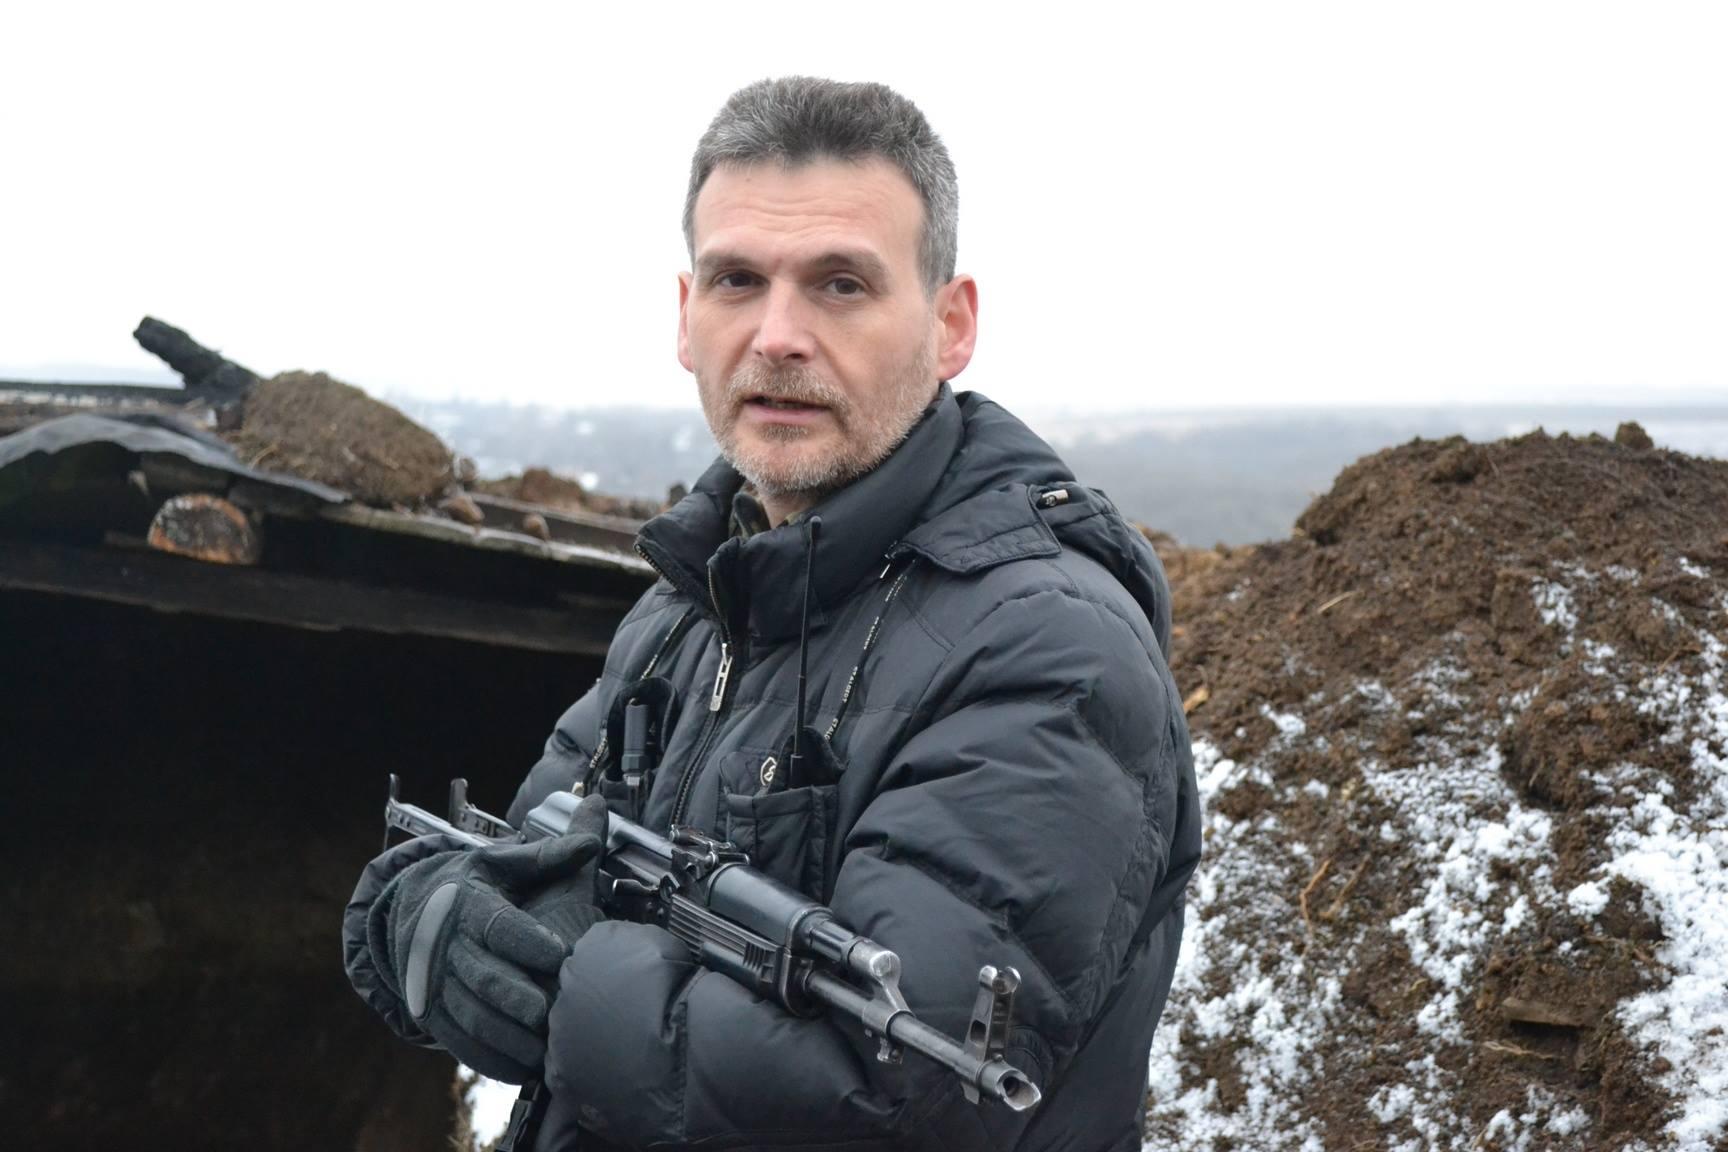 Комбат батальона «Призрак» Алексей Марков